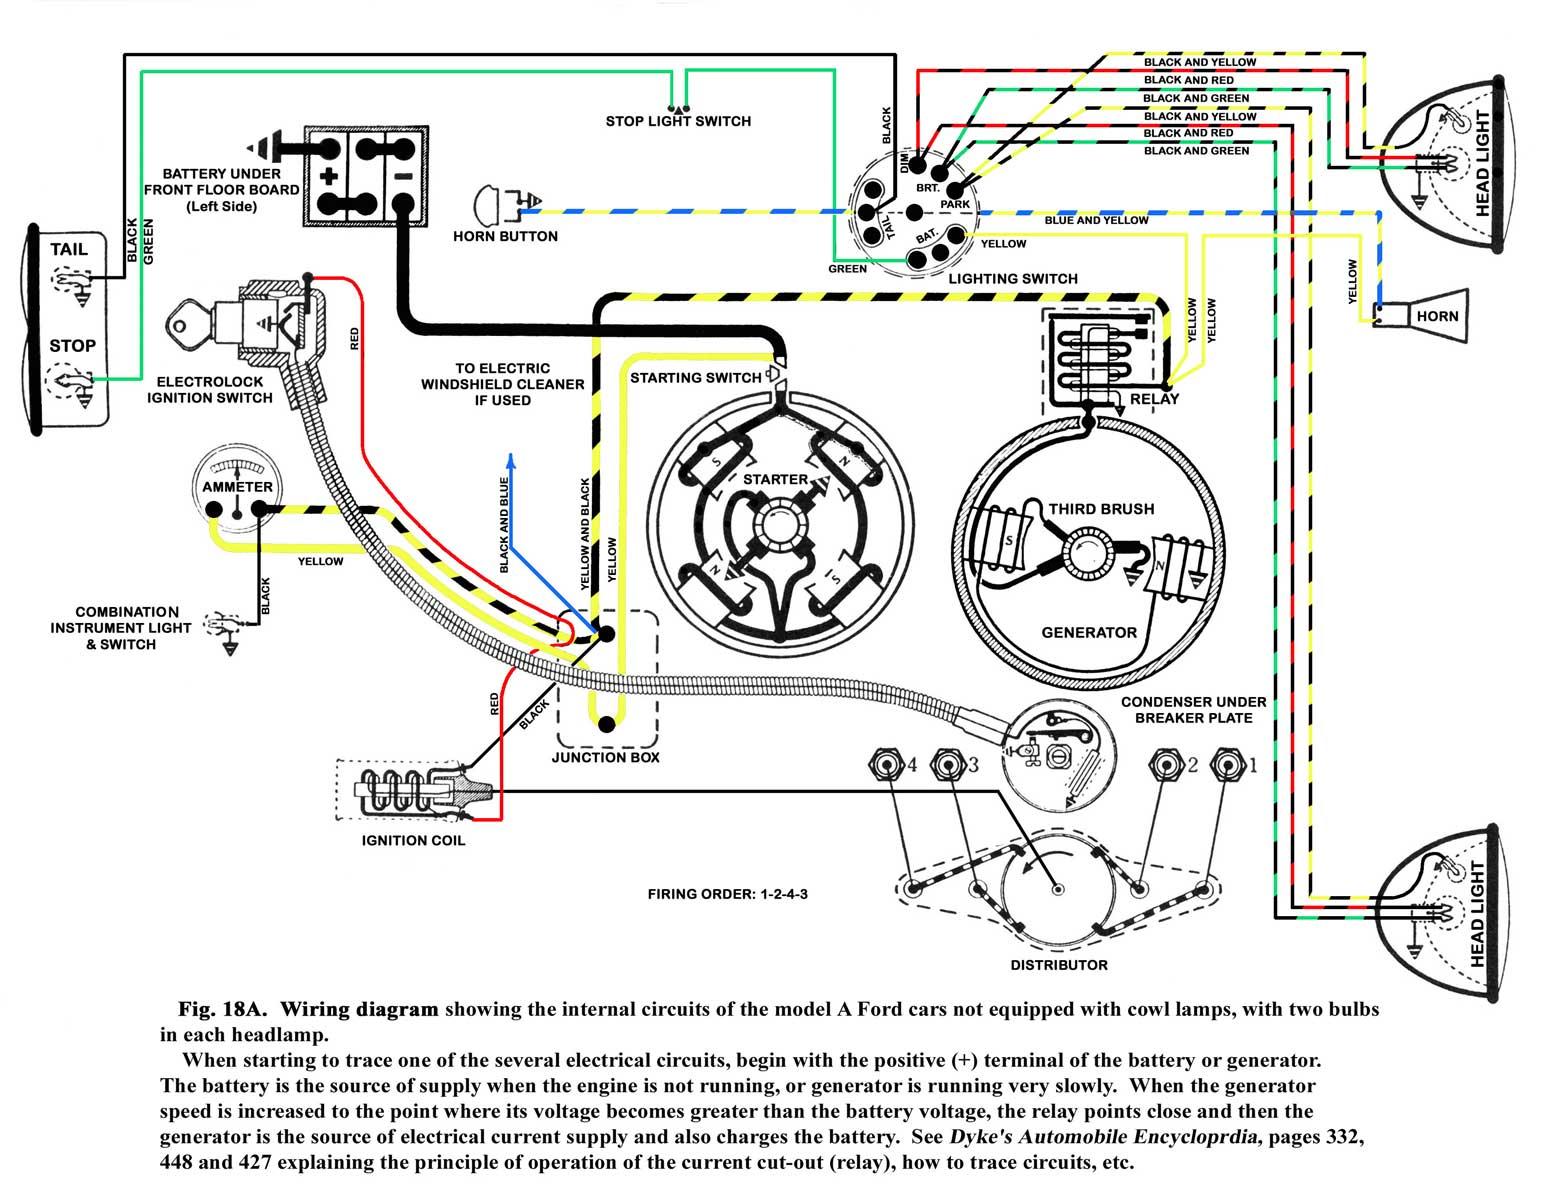 hight resolution of ford flathead 12 volt wiring schematic wiring diagramford f1 12 volt generator wiring diagram wiring diagram